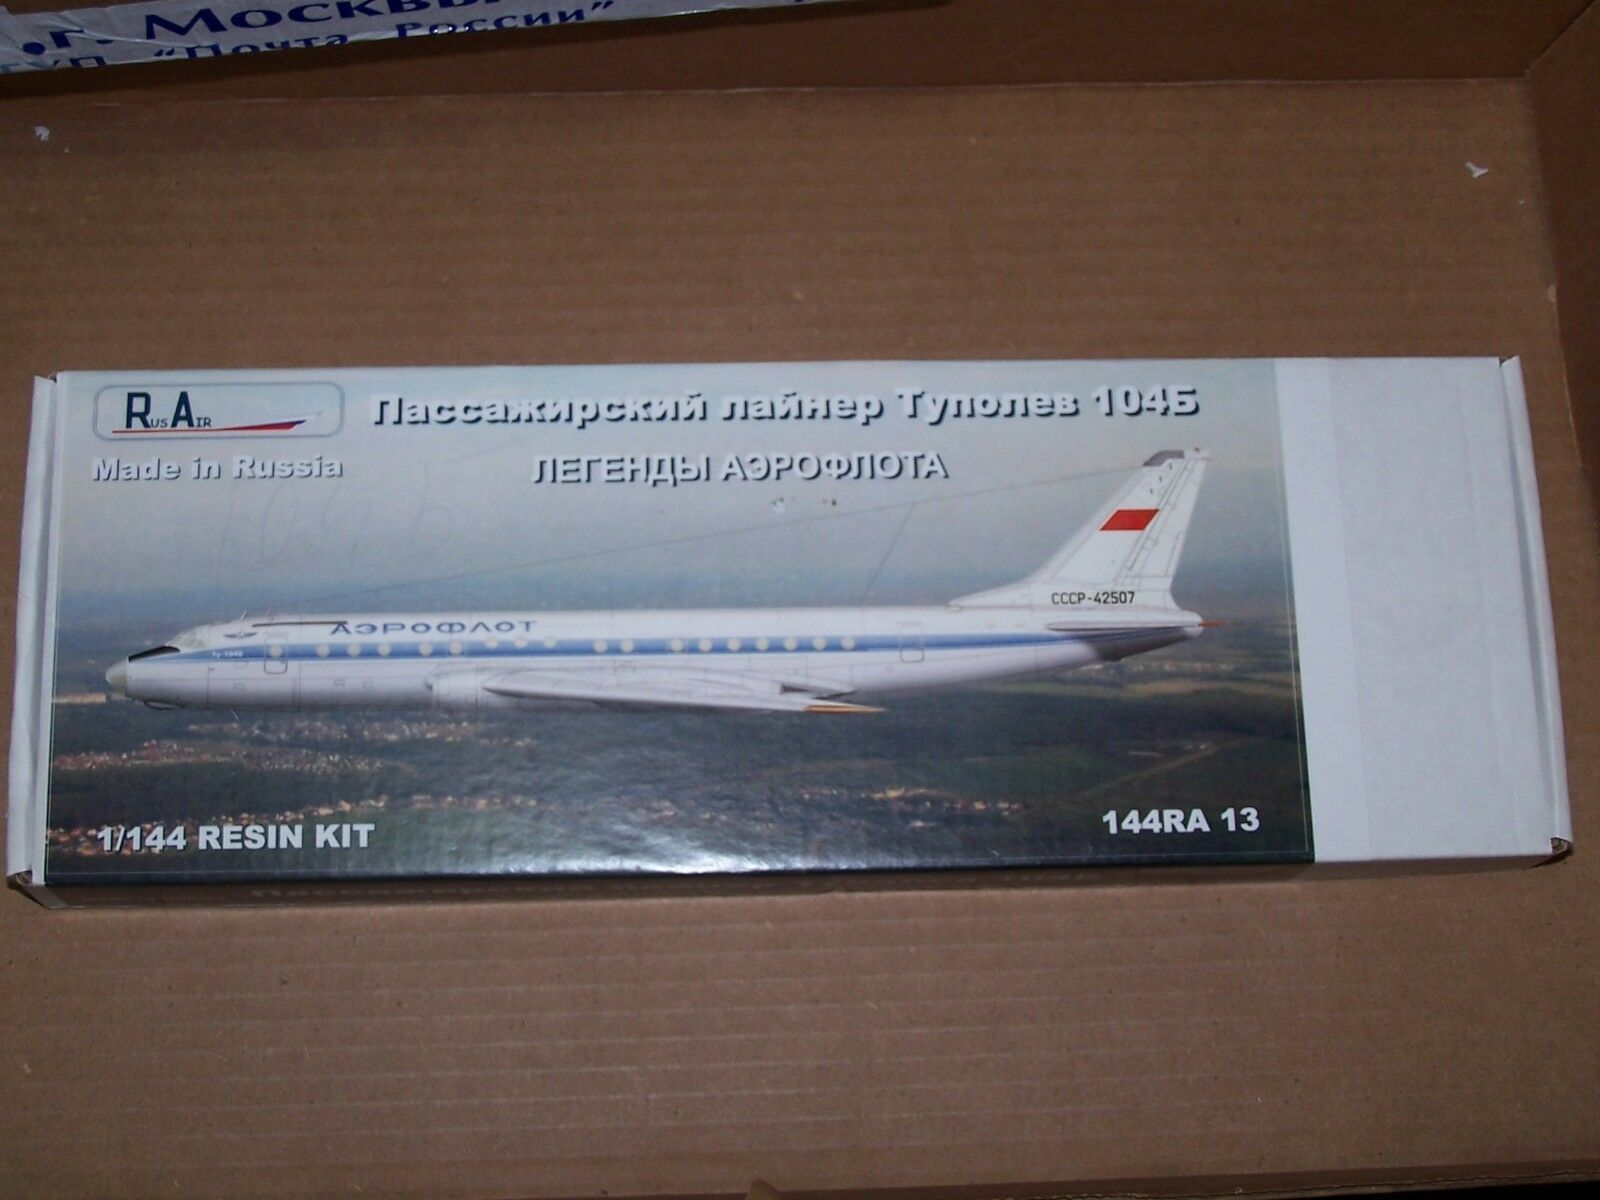 1 144 Pas Model Tu-104B resin model kit